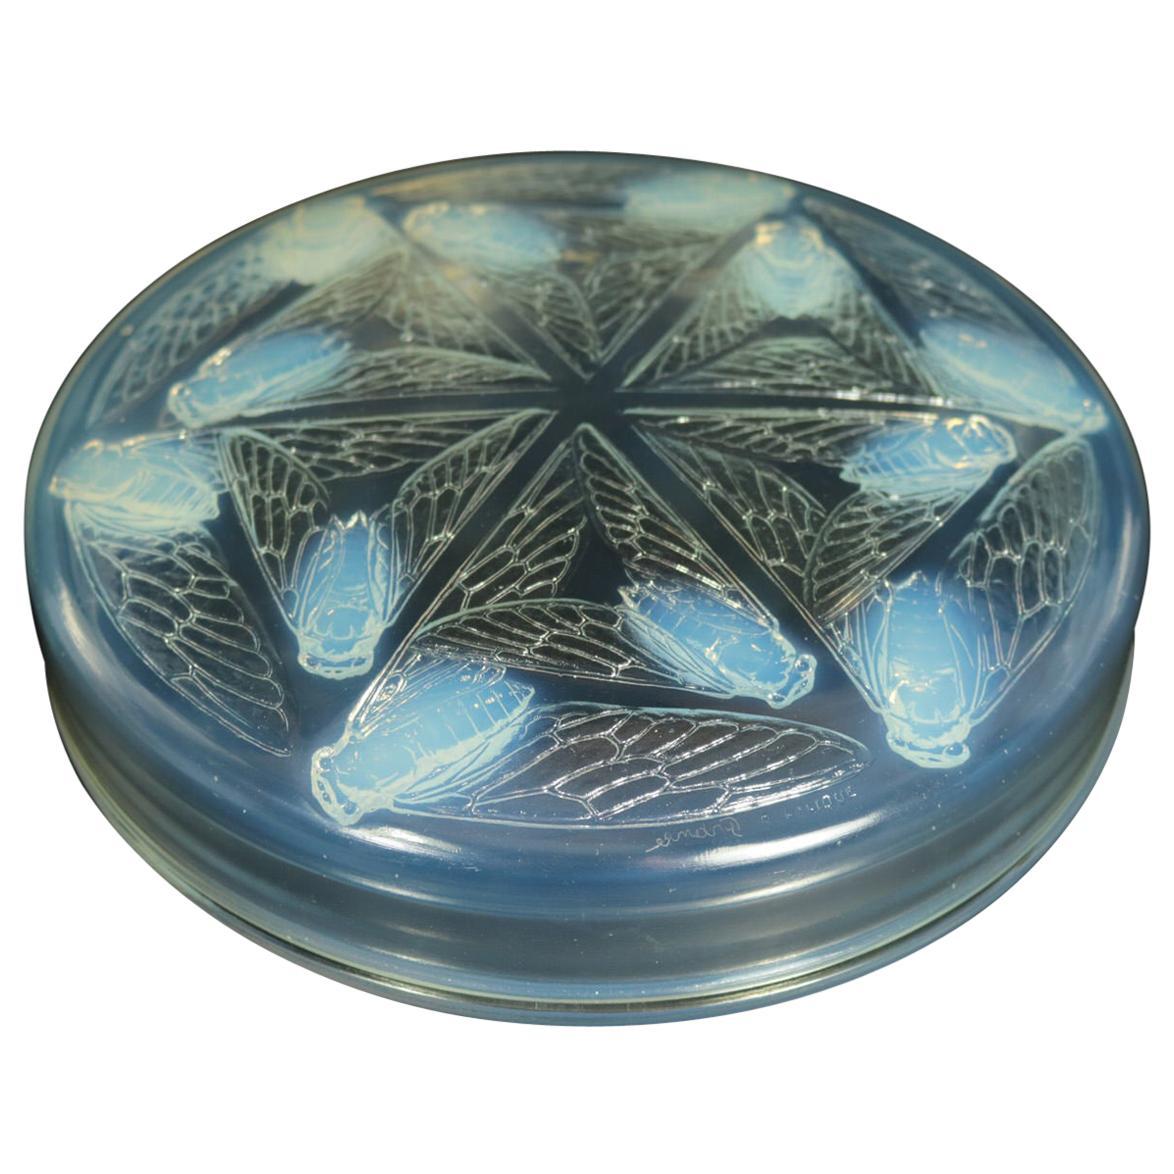 Rene Lalique Opalescent Glass 'Cigales' Box